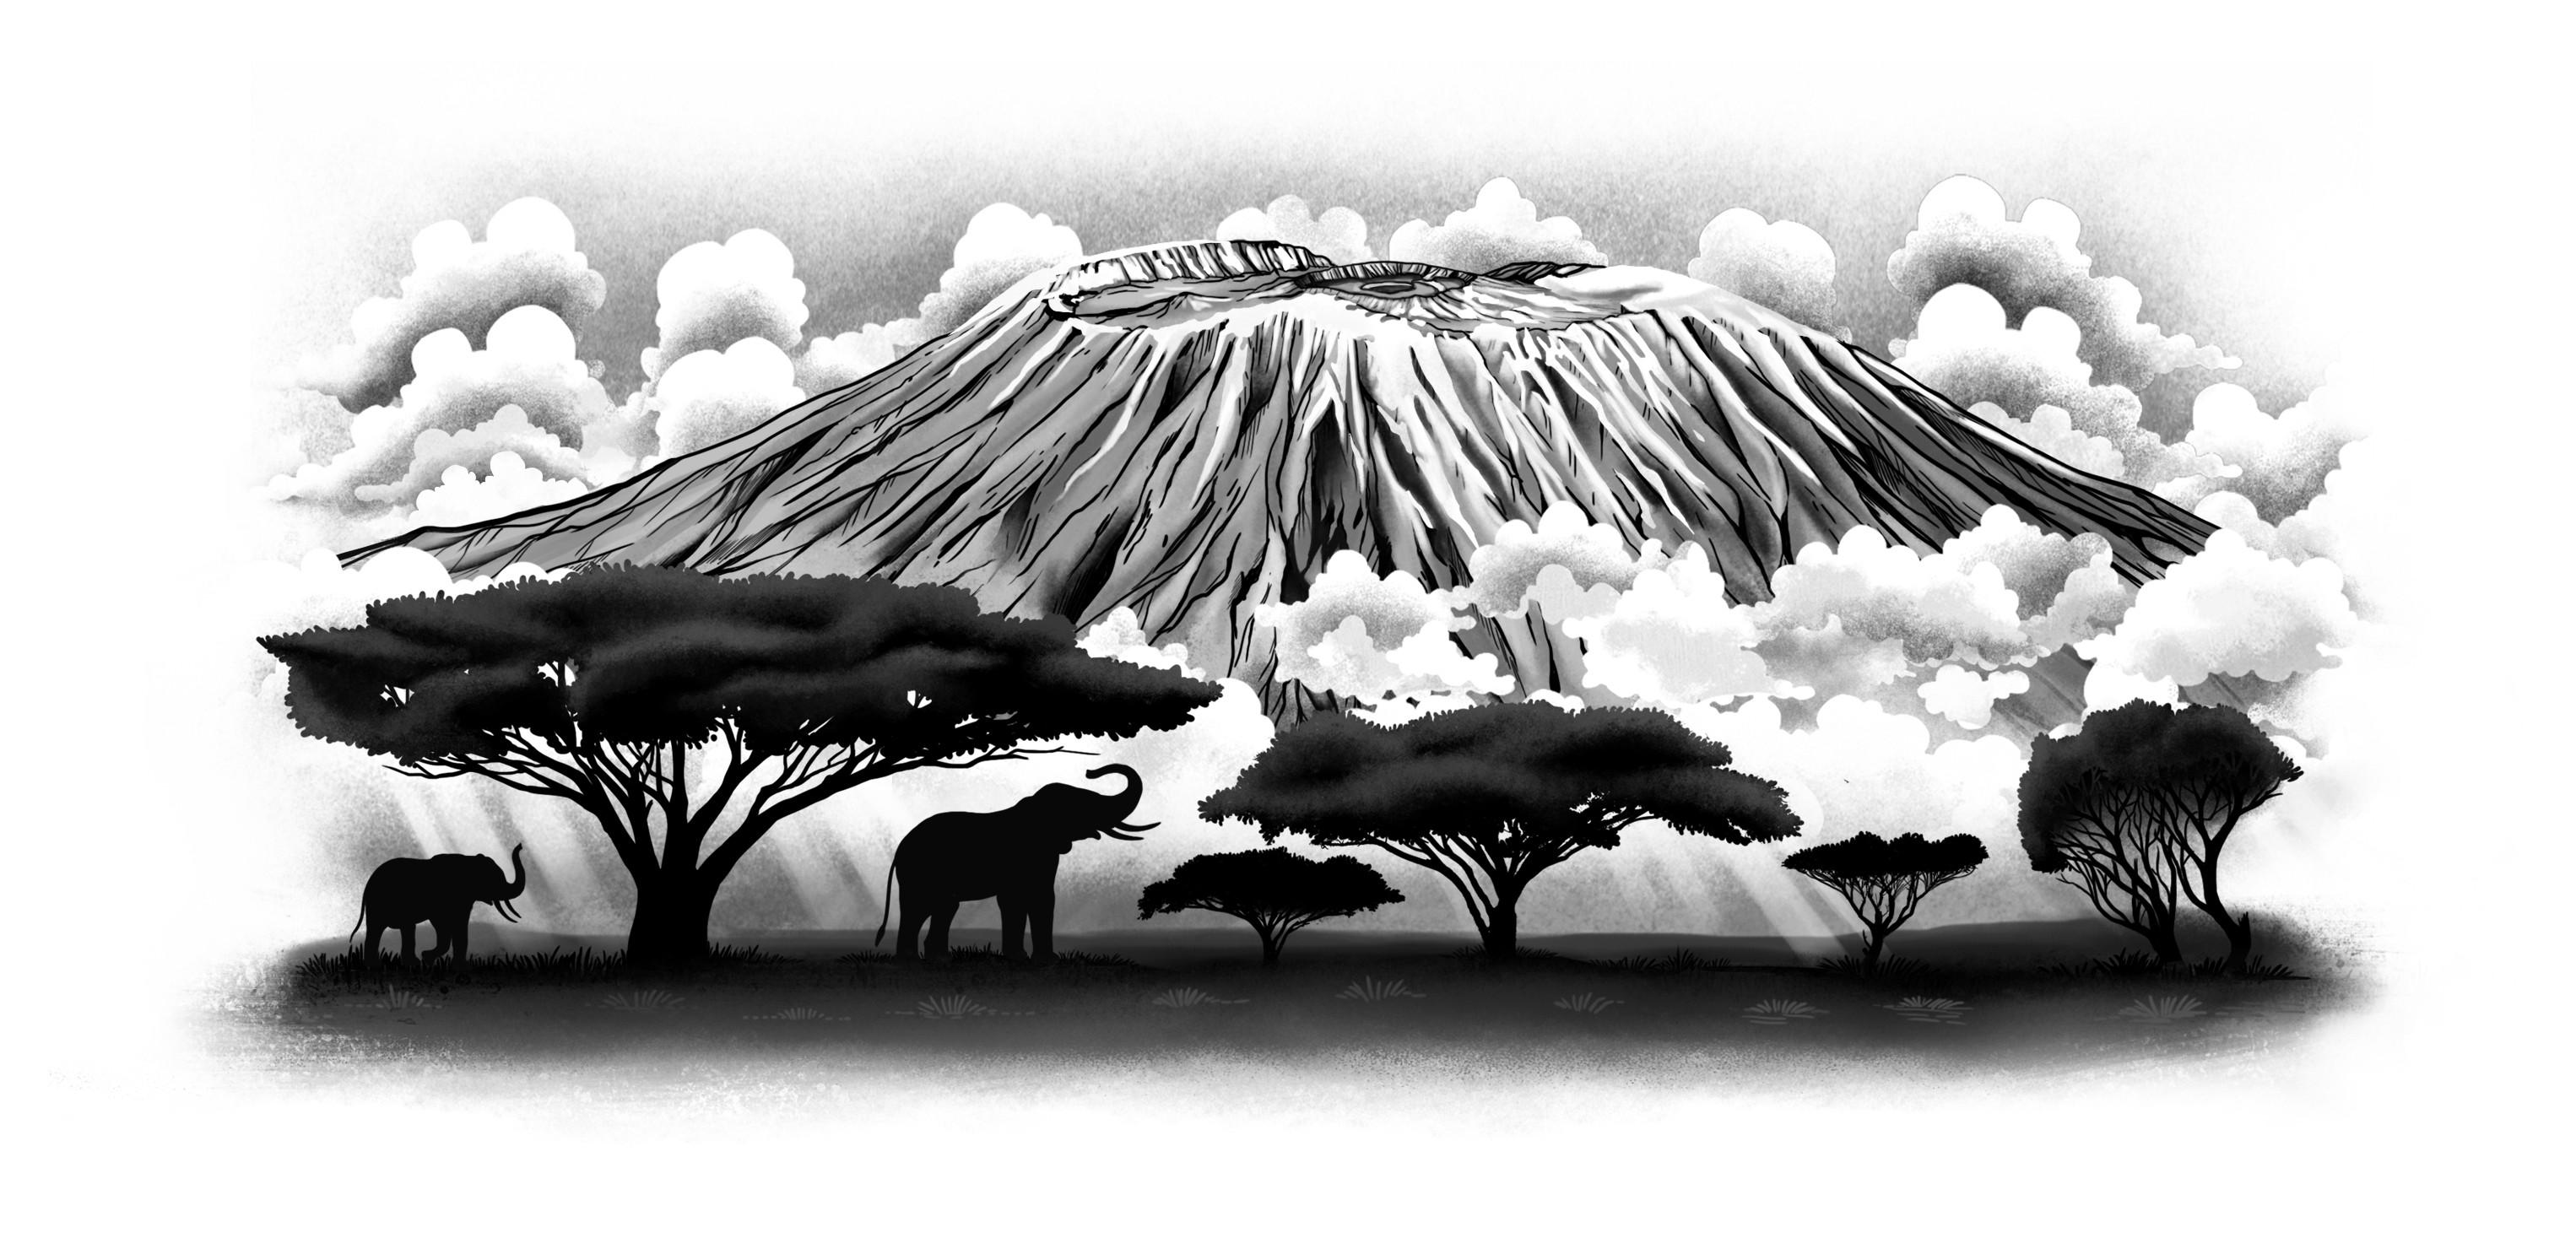 Mount Kilimanjaro tattoo